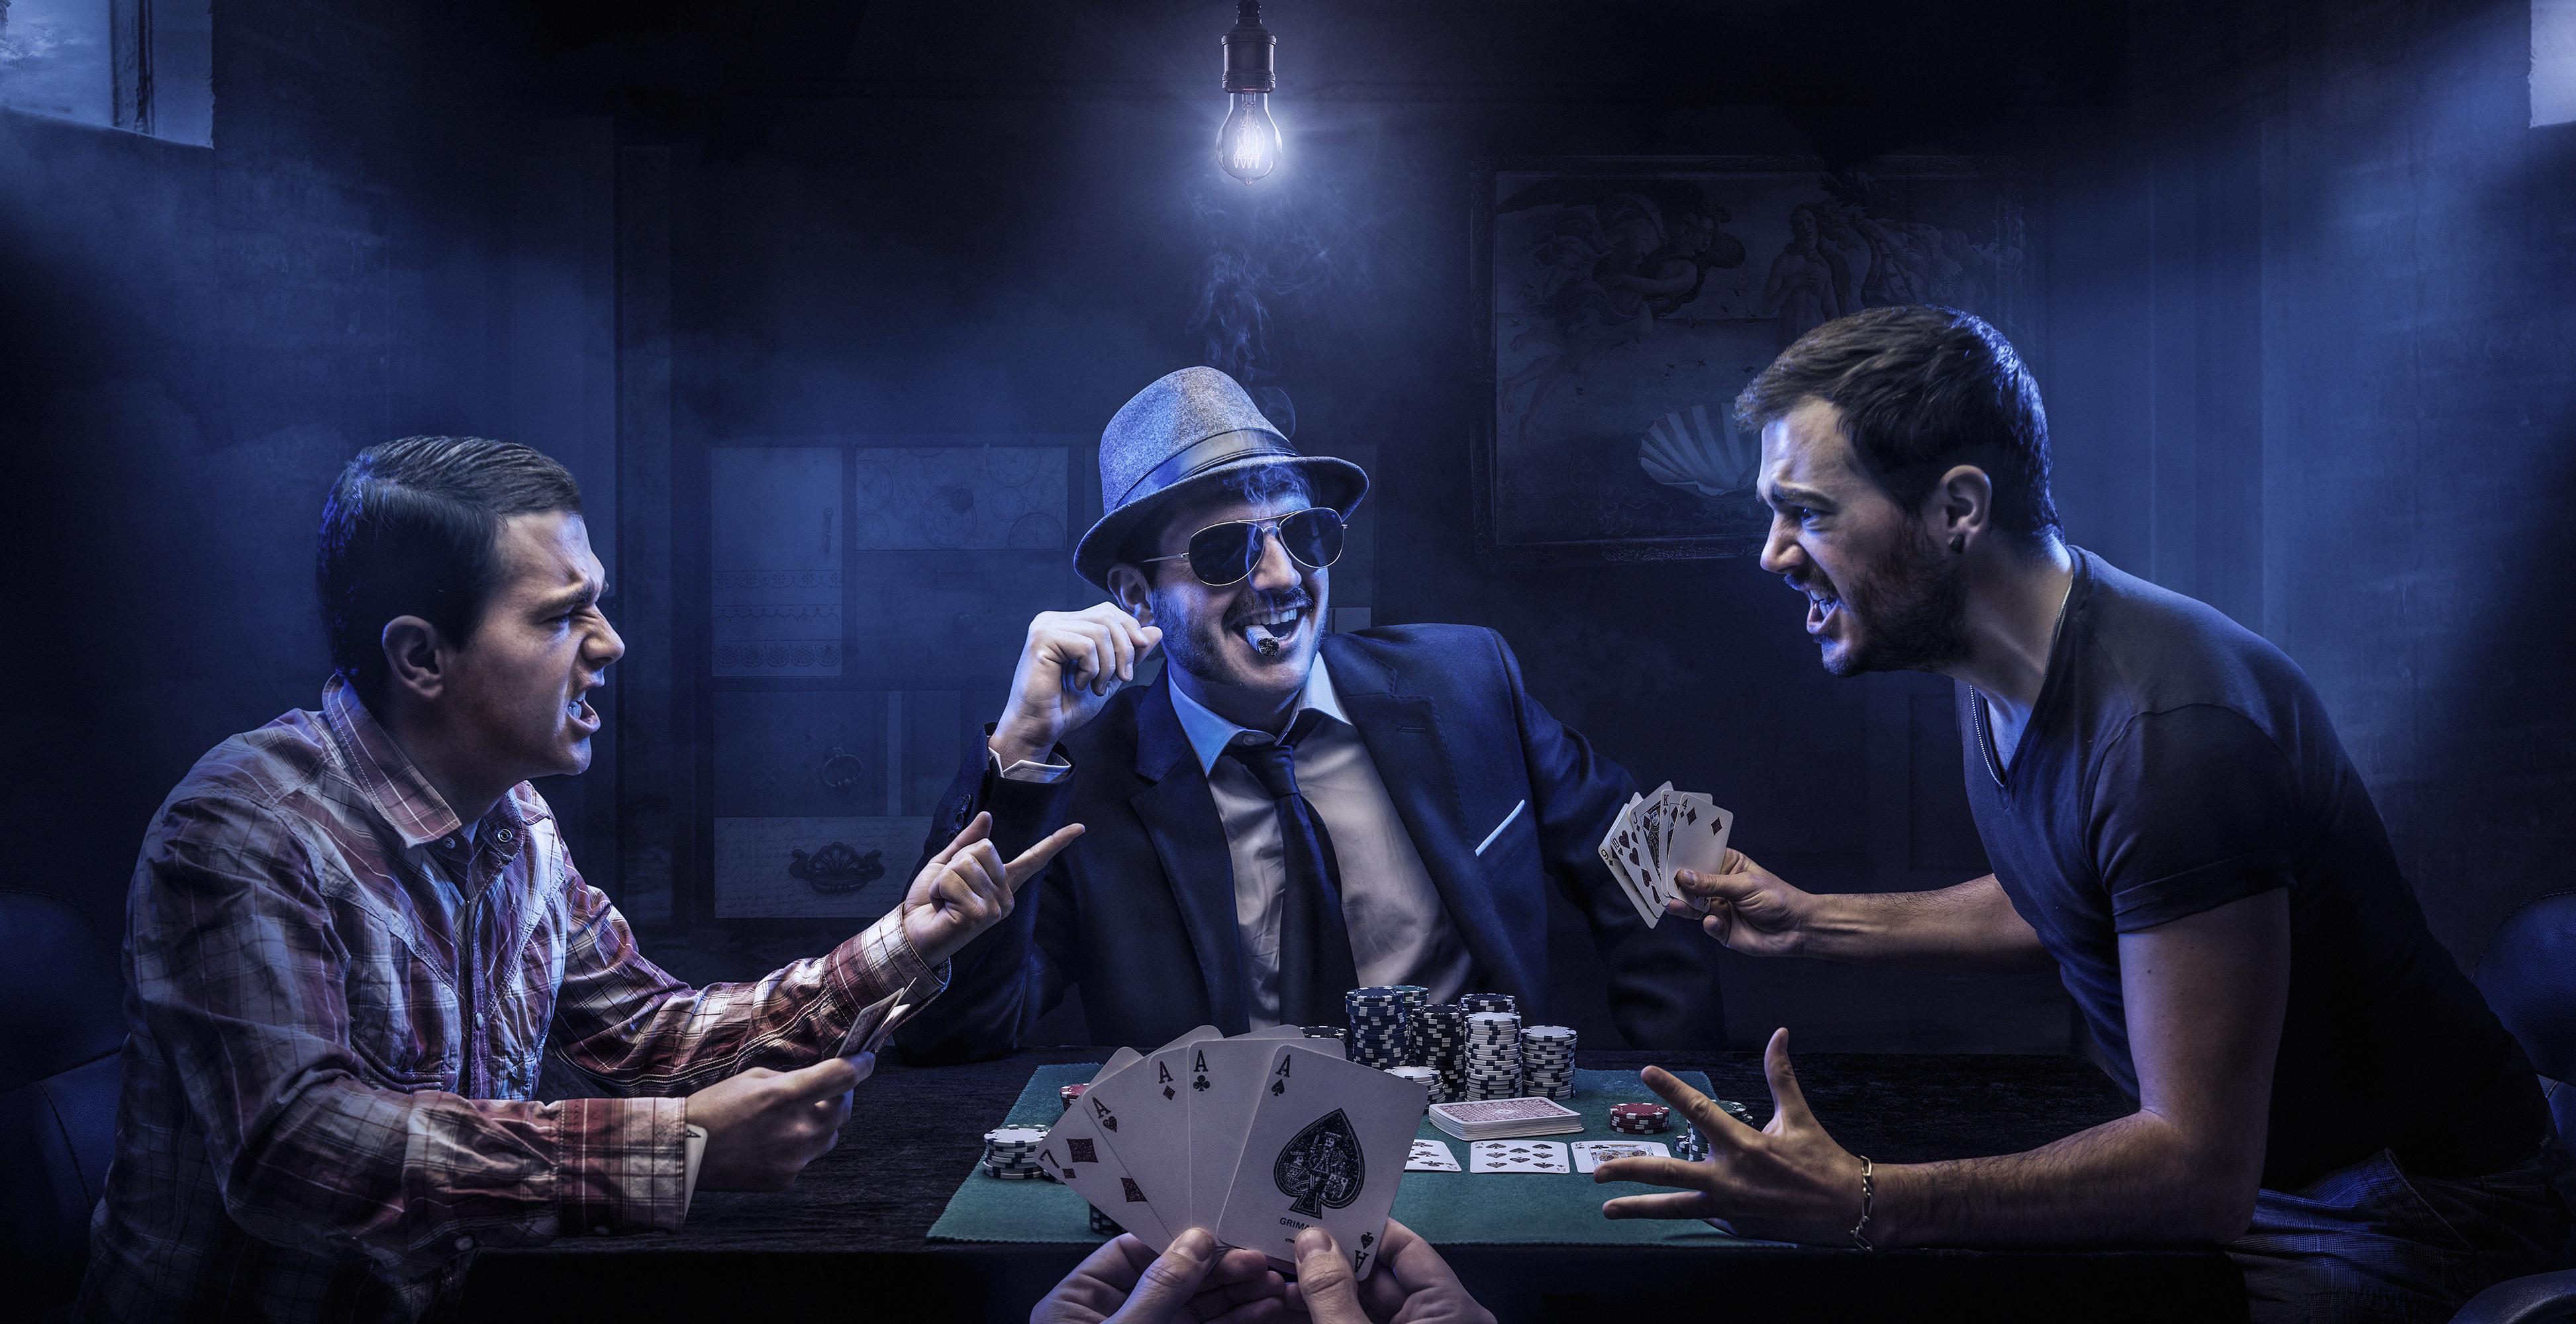 master poker ok m